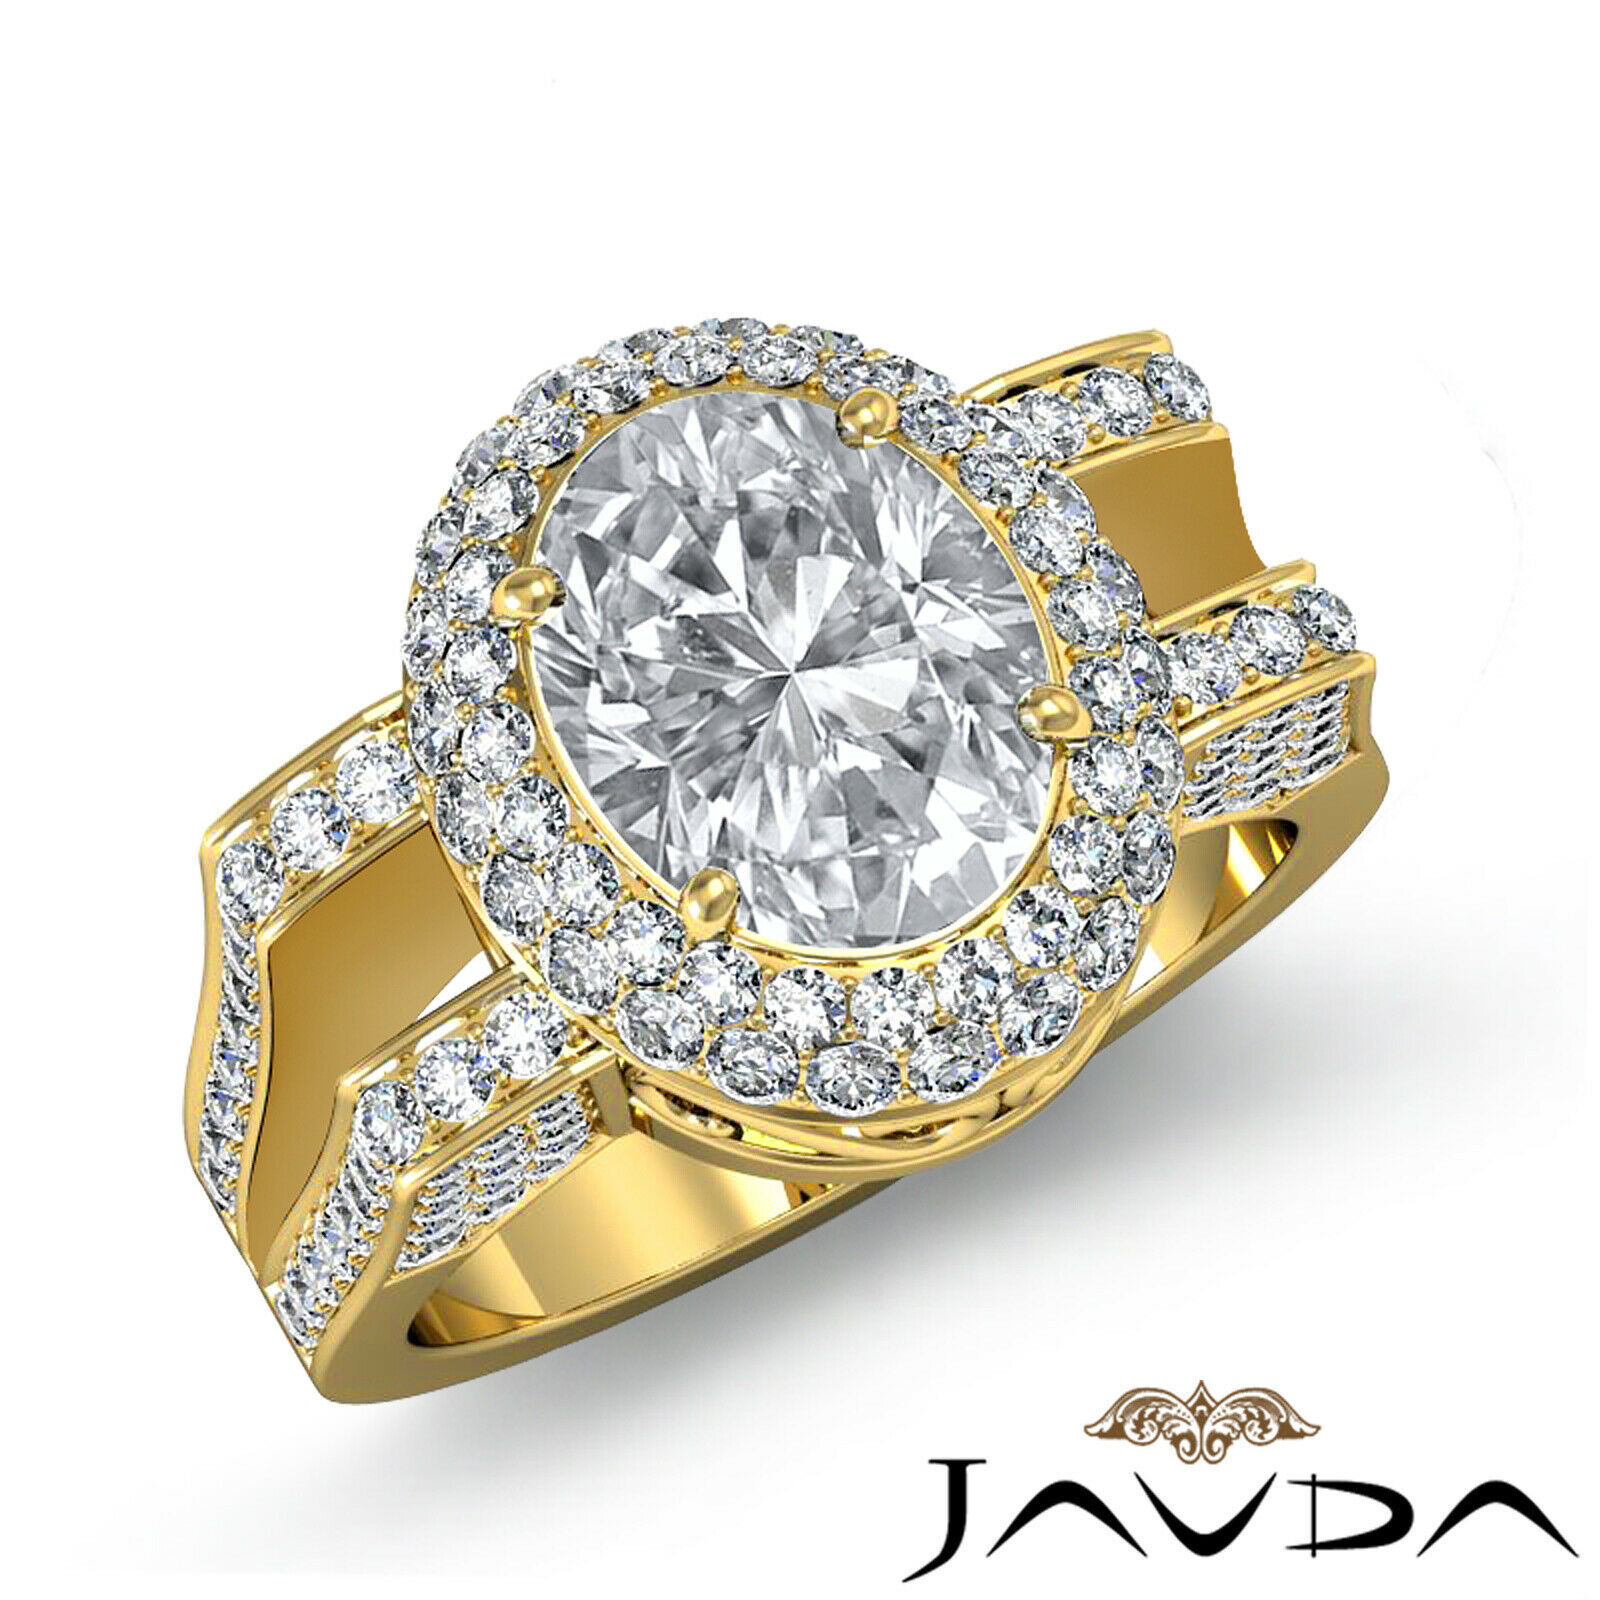 1.9ctw Gala Halo Split Shank Oval Diamond Engagement Ring GIA E-VS2 White Gold 7